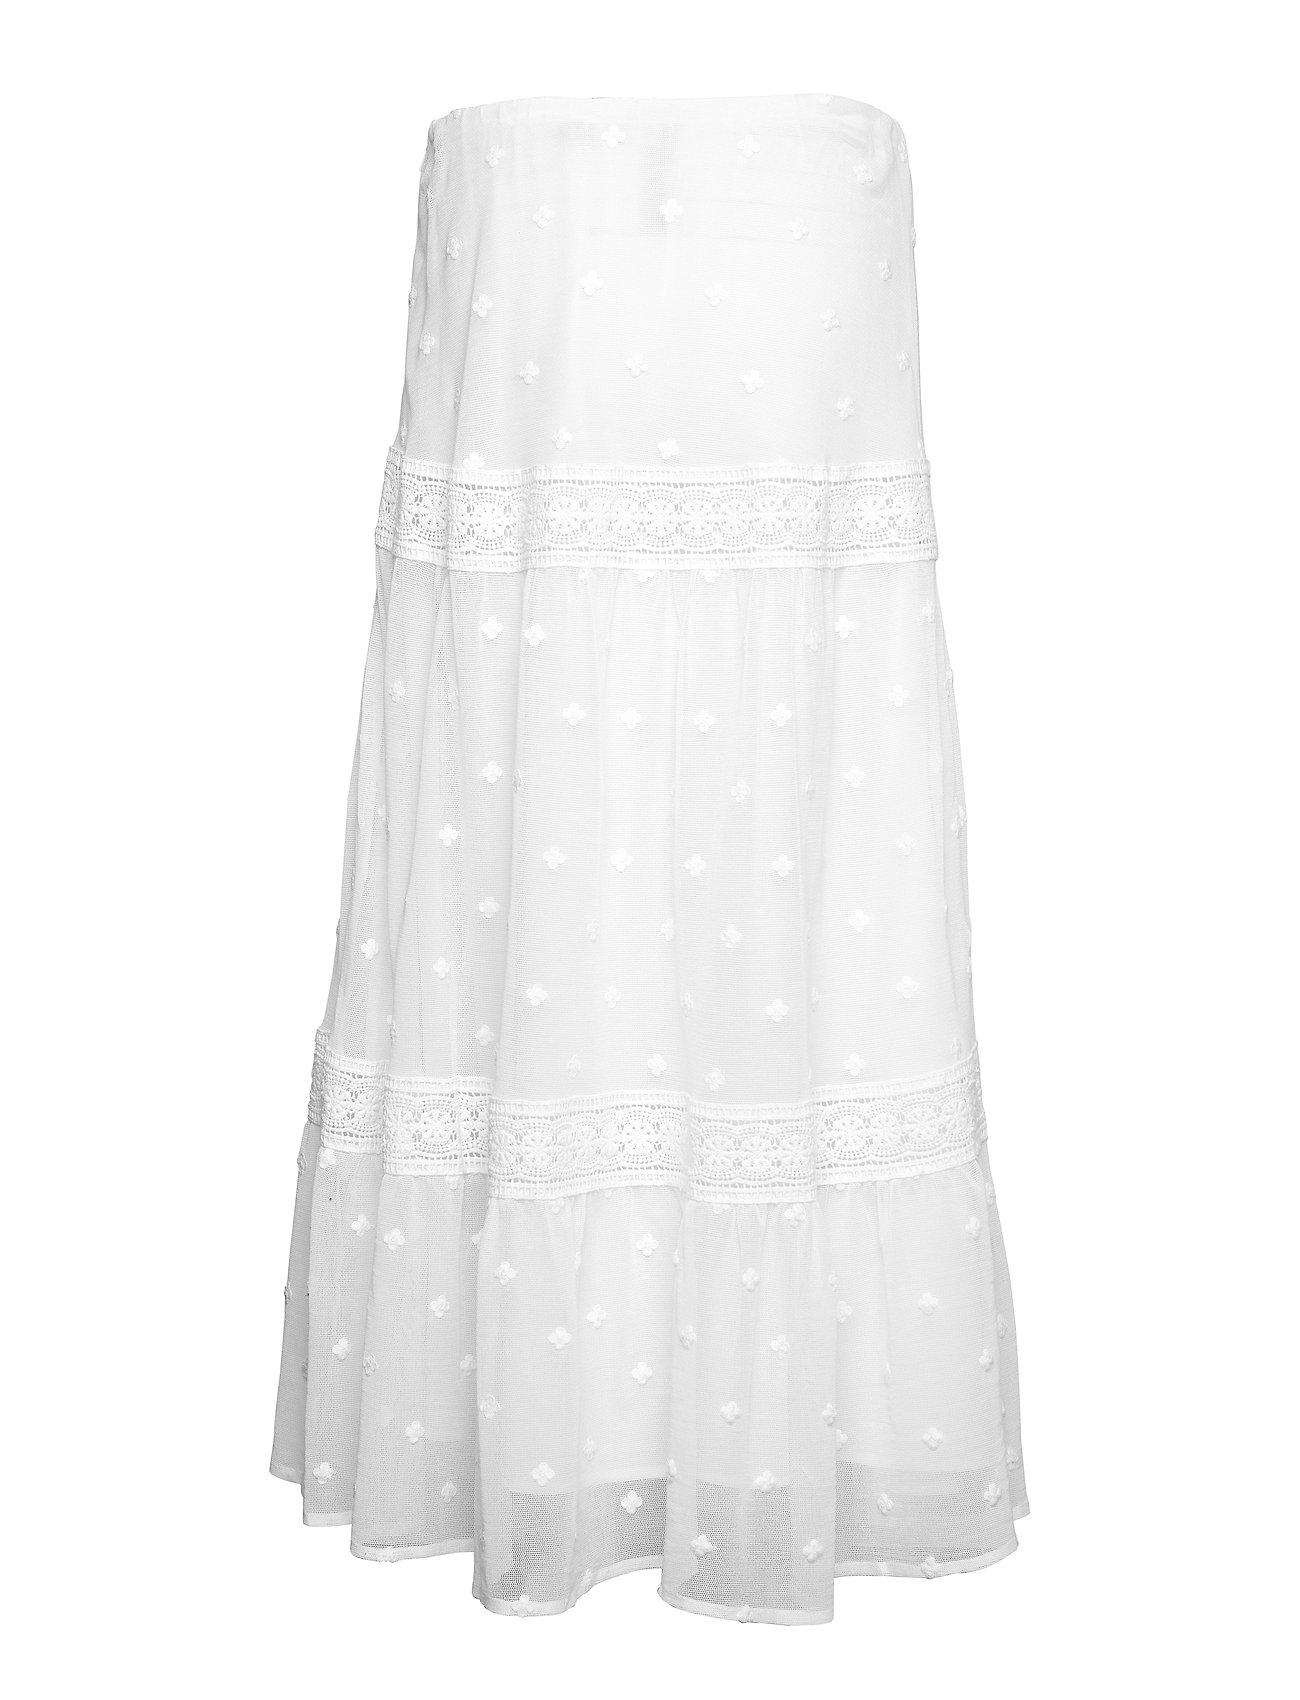 Lace SkirtwhiteLauren Cotton blend trim Ralph D9EYWI2H